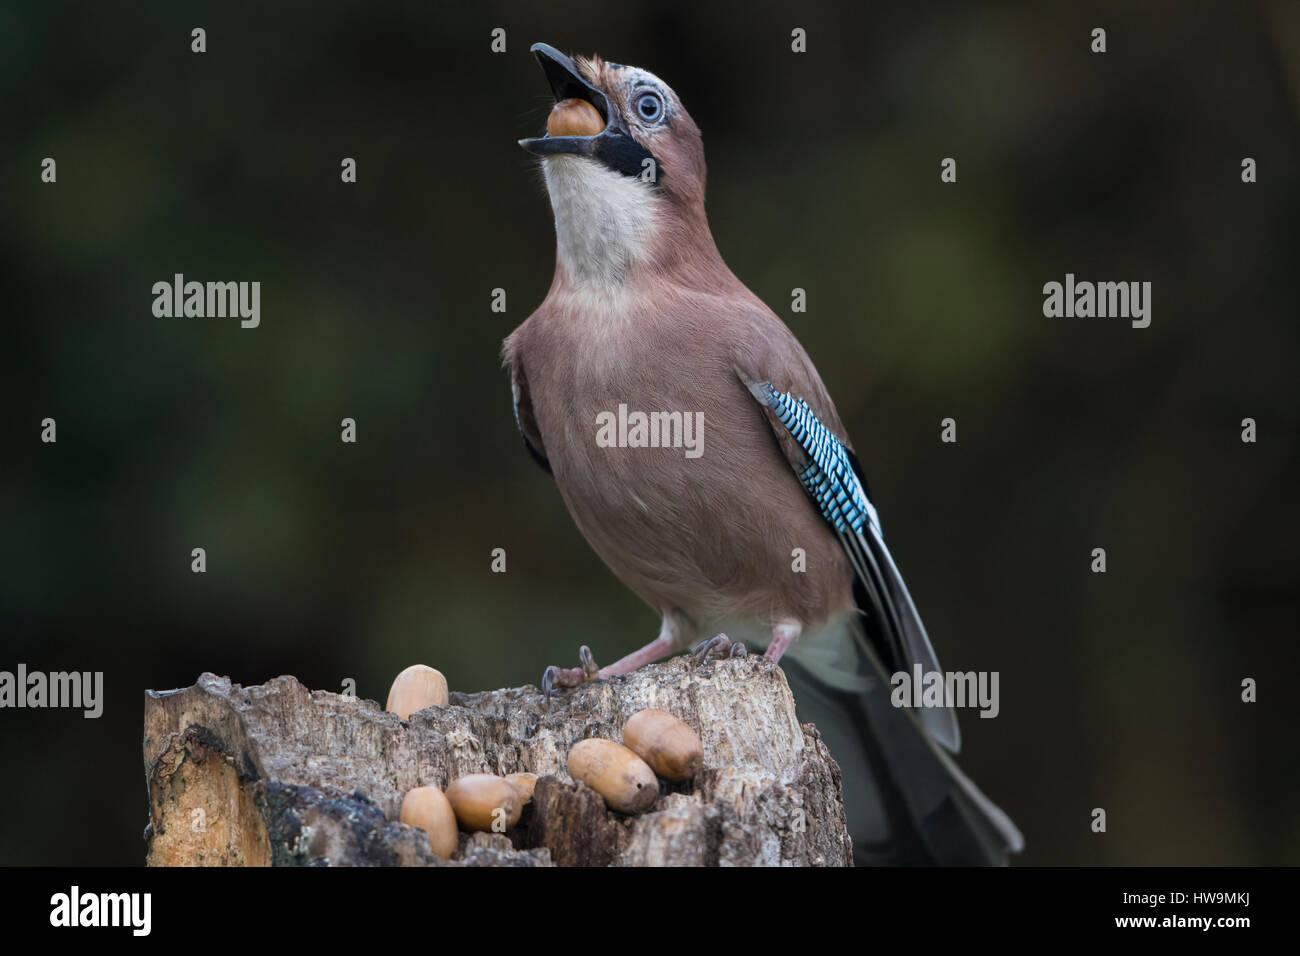 A Eurasian Jay (Garrulus glandarius) swallowing an acorn in garden, Hastings, East Sussex, UK - Stock Image